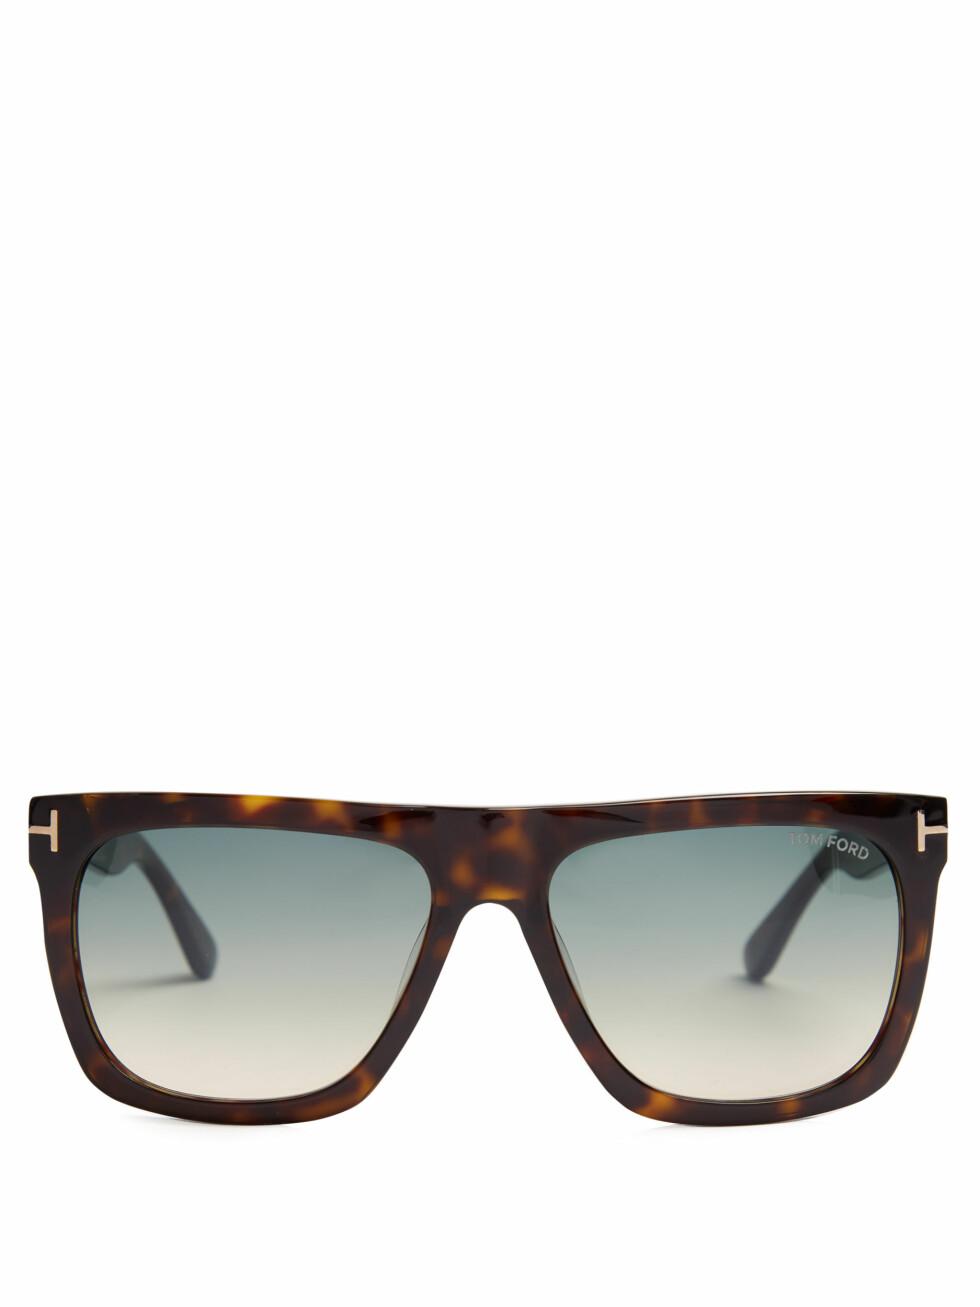 Solbriller fra Tom Ford via Matchesfashion.com   kr 2085   http://www.matchesfashion.com/intl/products/Tom-Ford-Eyewear-Morgan-flat-top-sunglasses--1097182